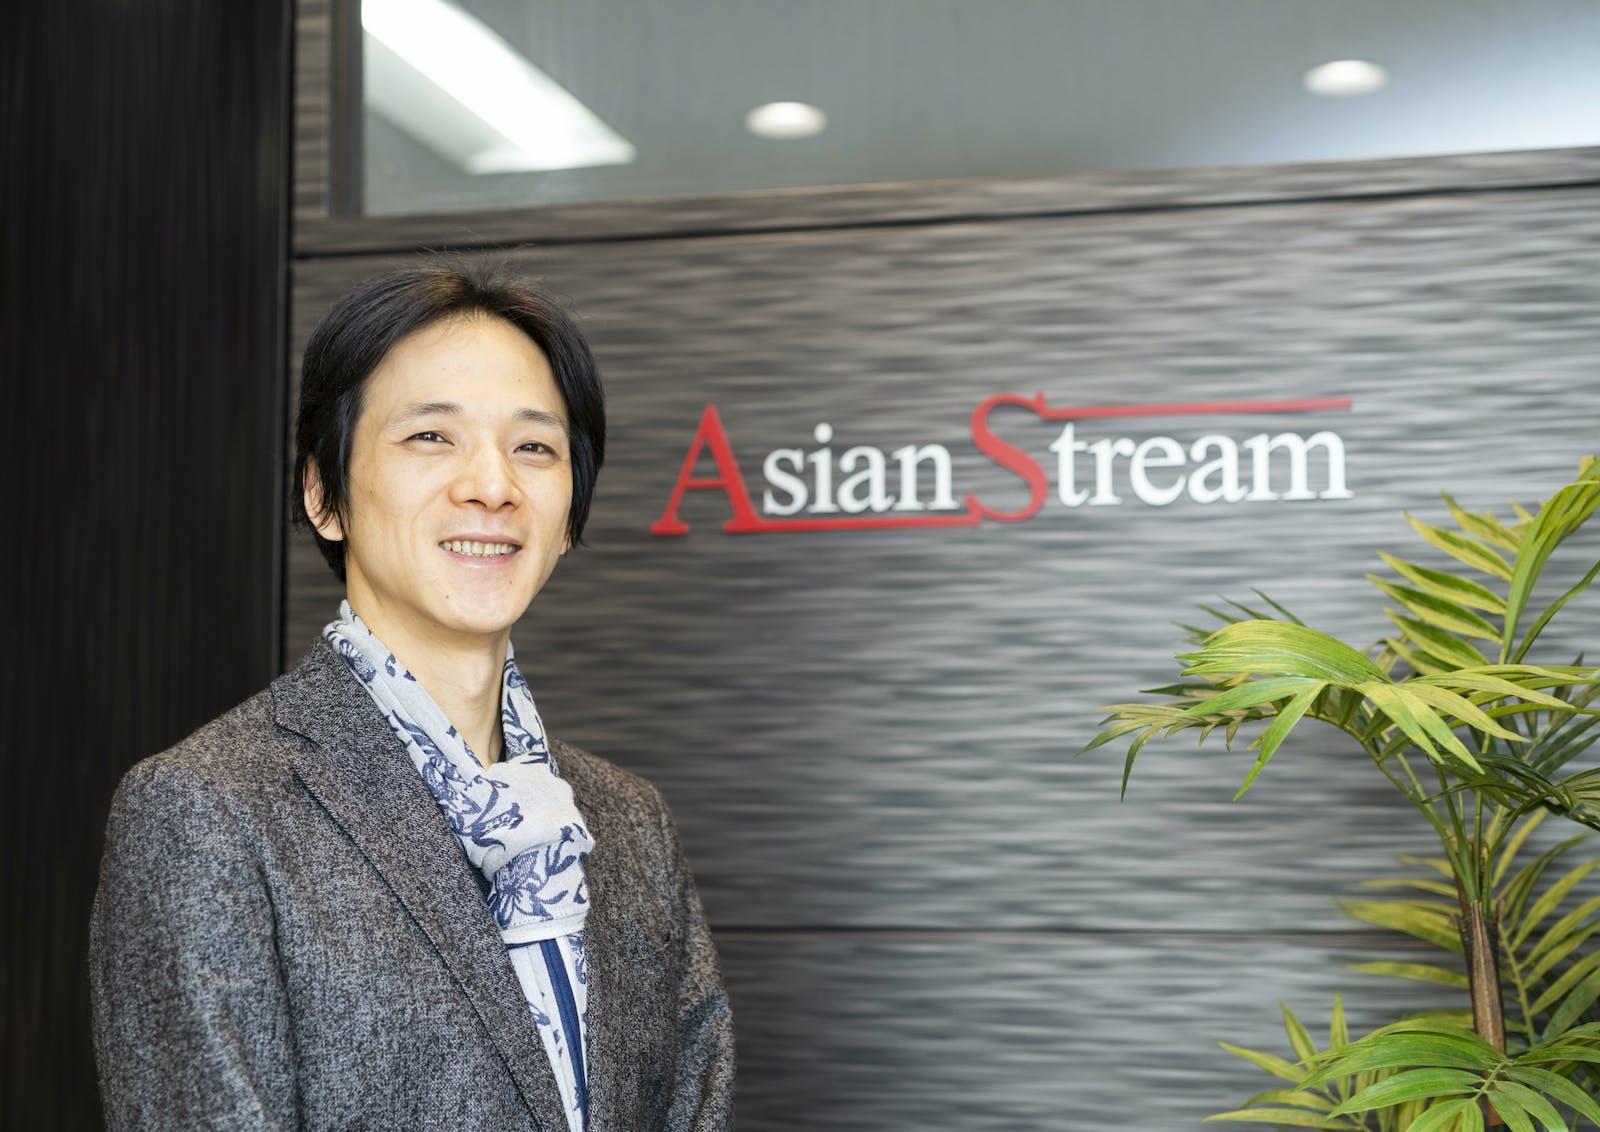 AsianStream株式会社のアイキャッチ画像